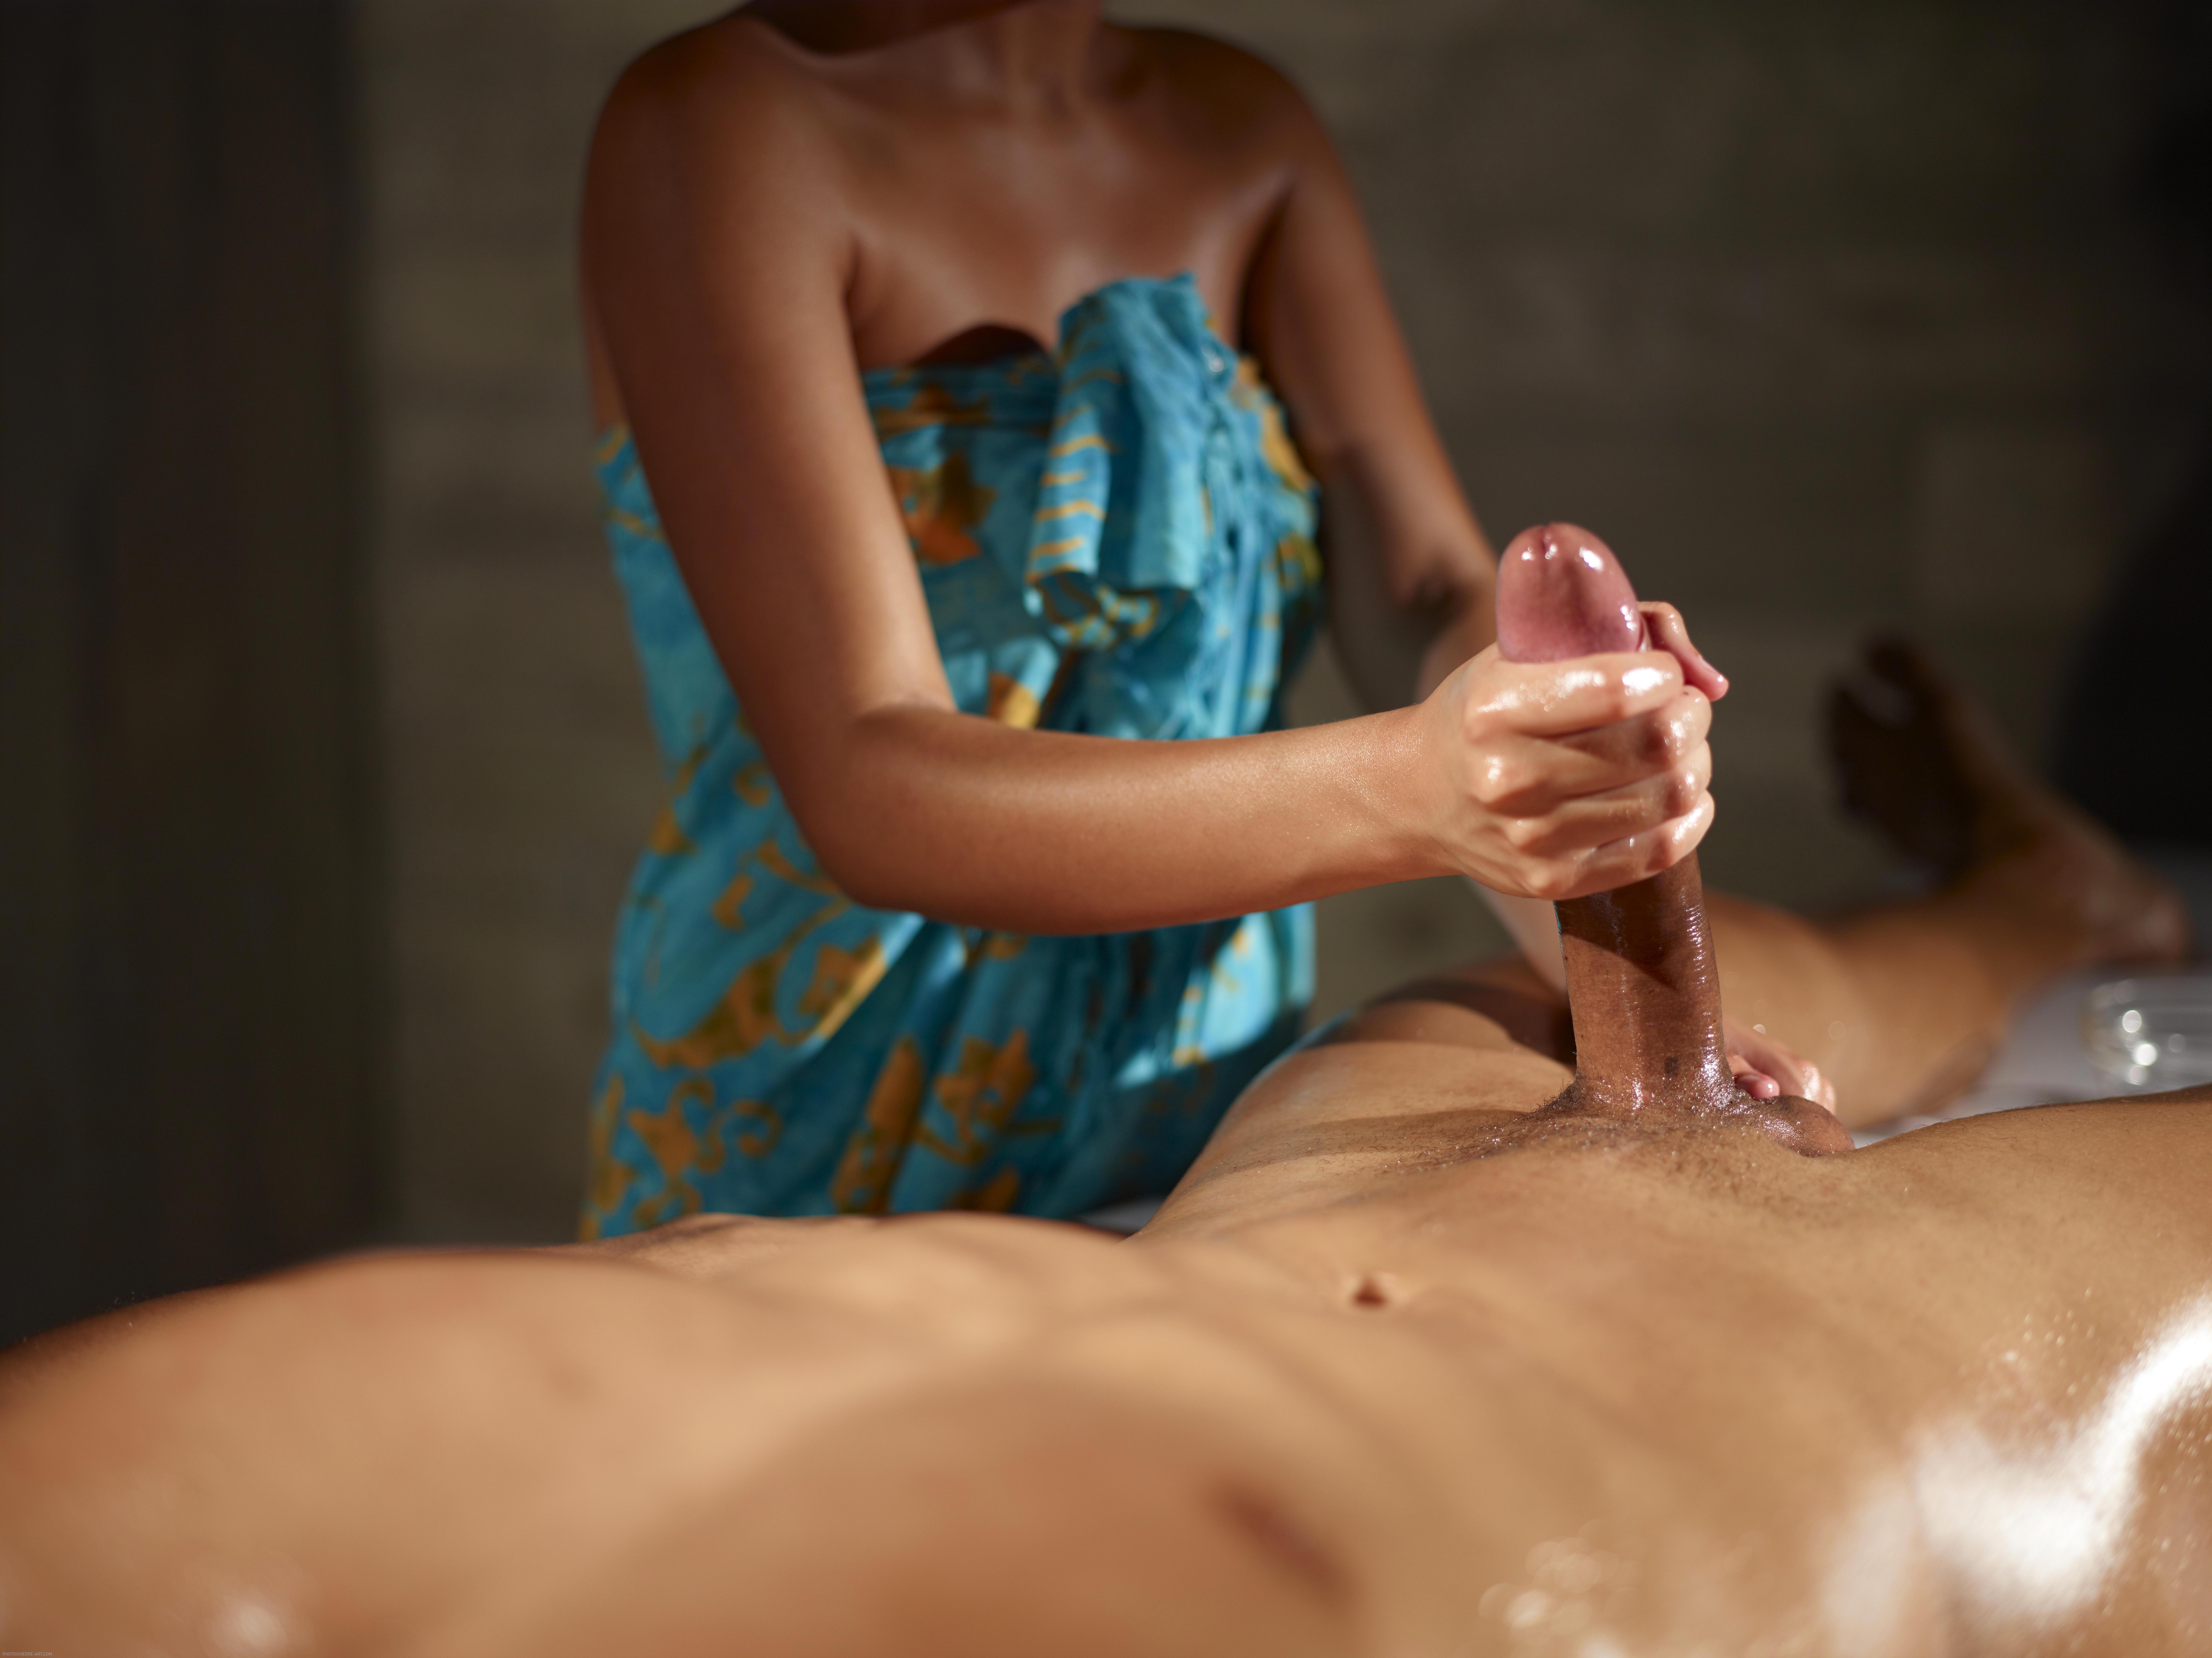 penismassage massage i hillerød